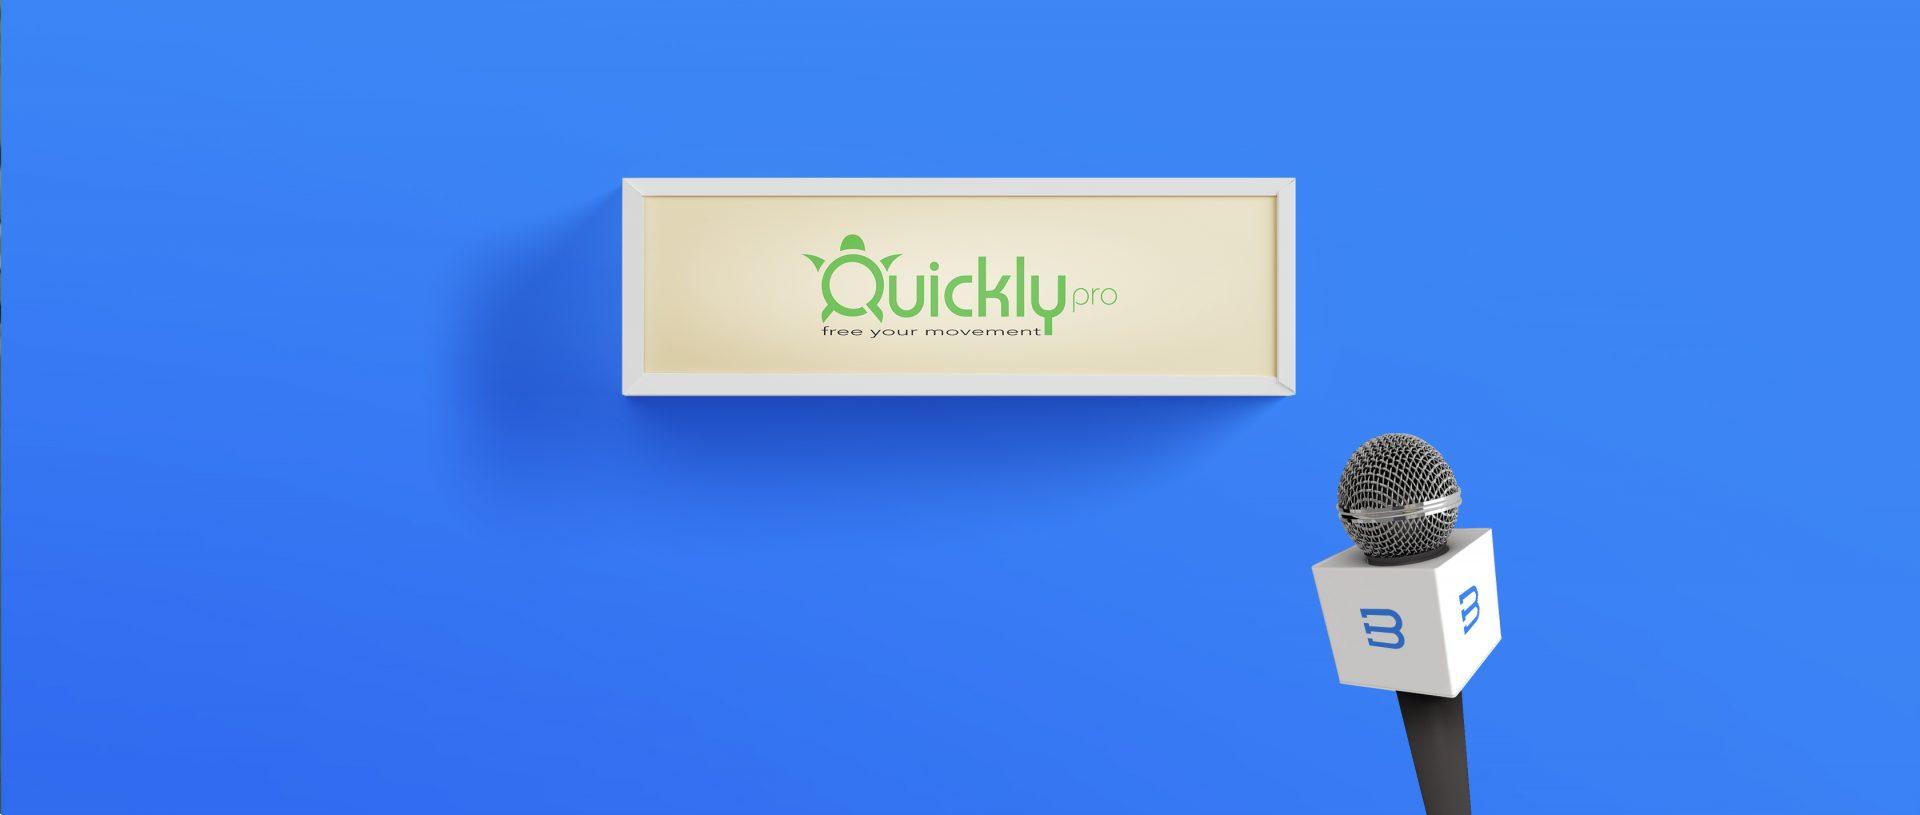 Quicklypro